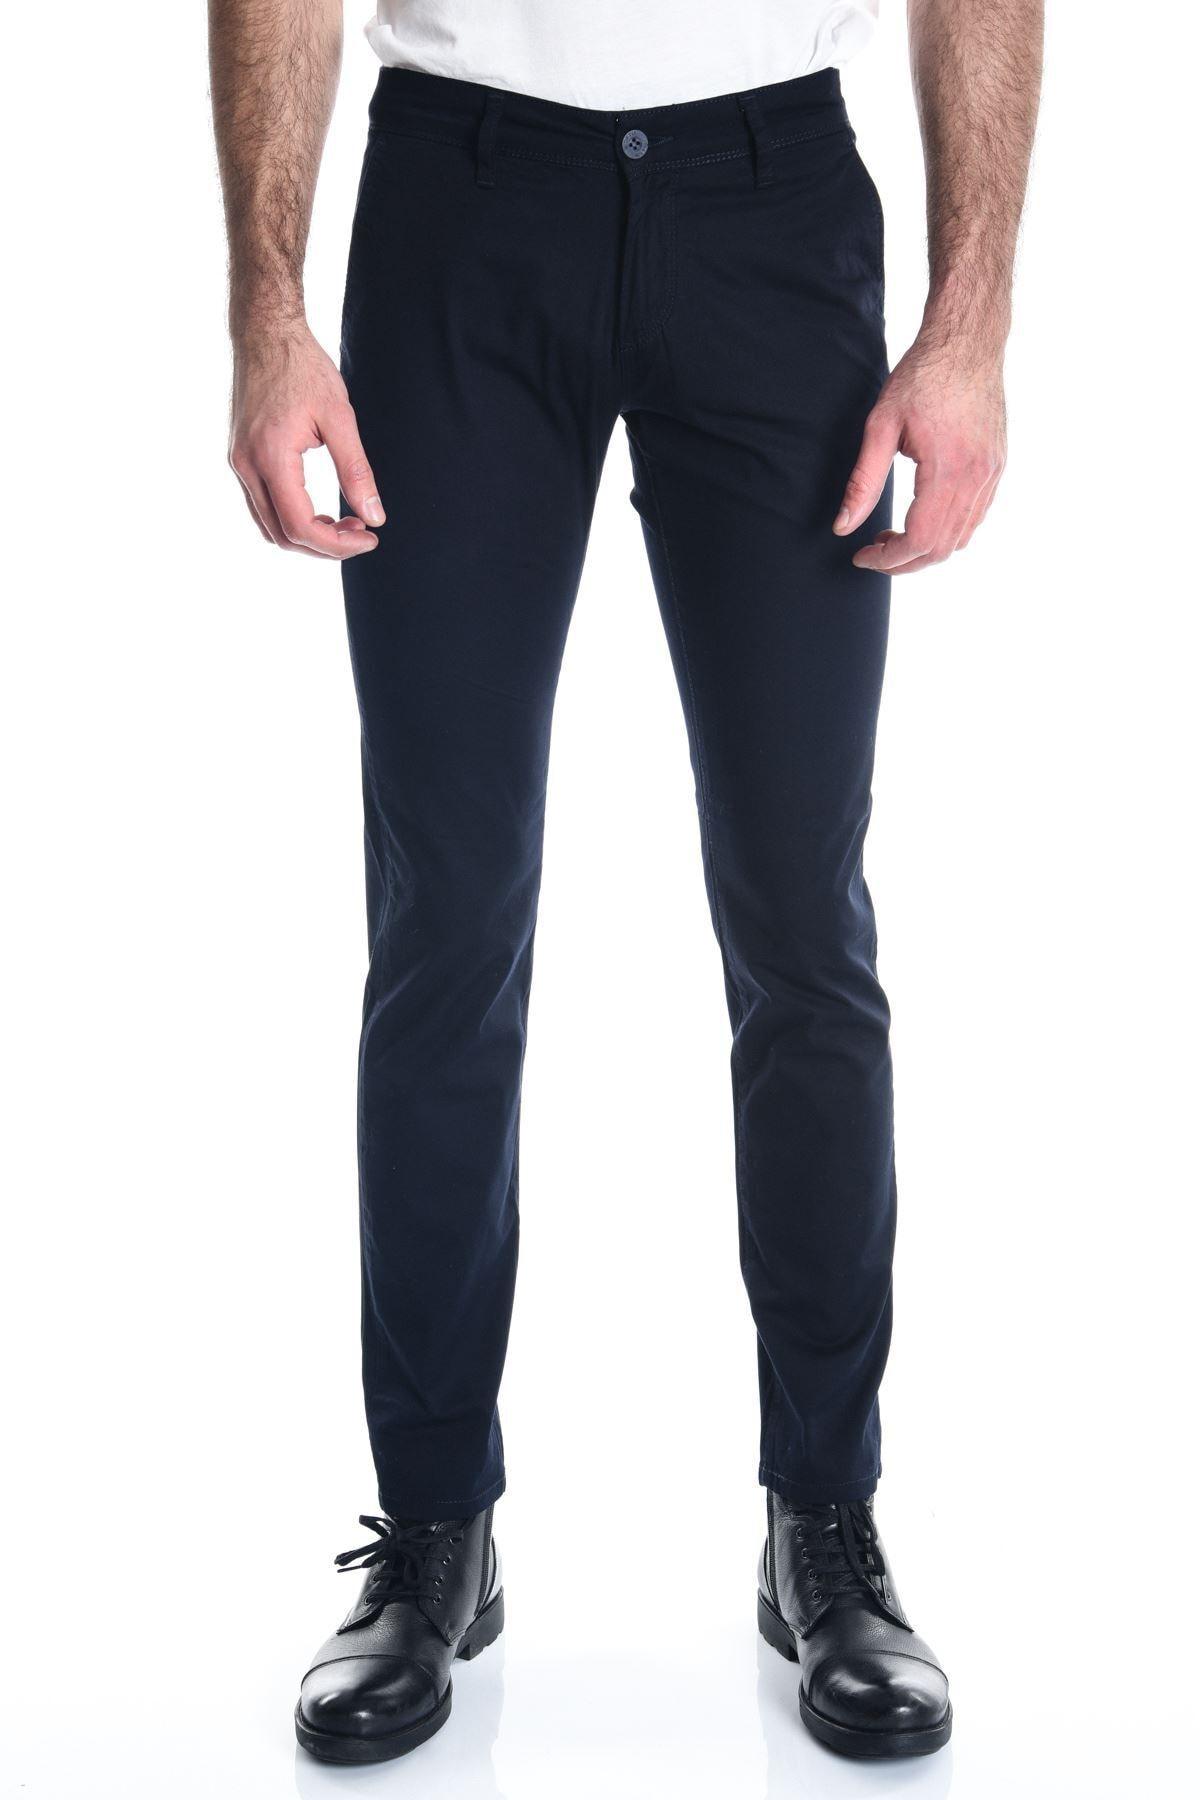 LTC Jeans Lacivert Chino Slimfit Erkek Pantolon 1